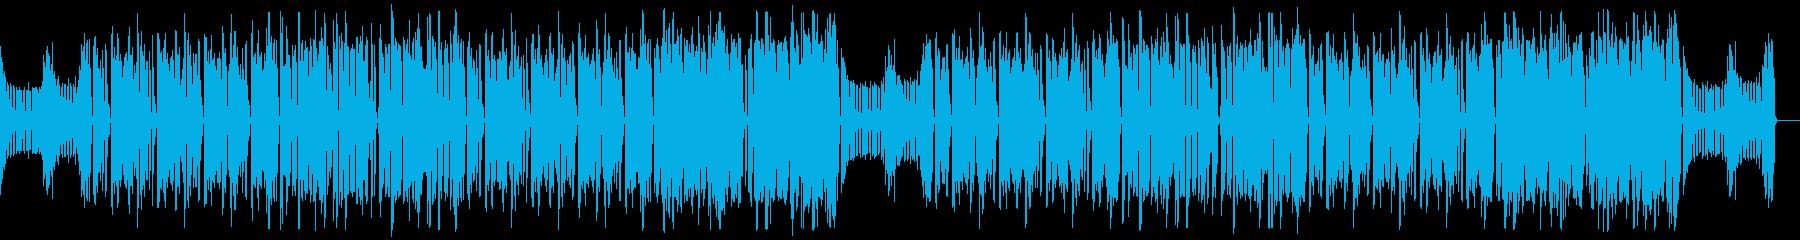 【EDM,ダブステップ】映像、CM制作向の再生済みの波形